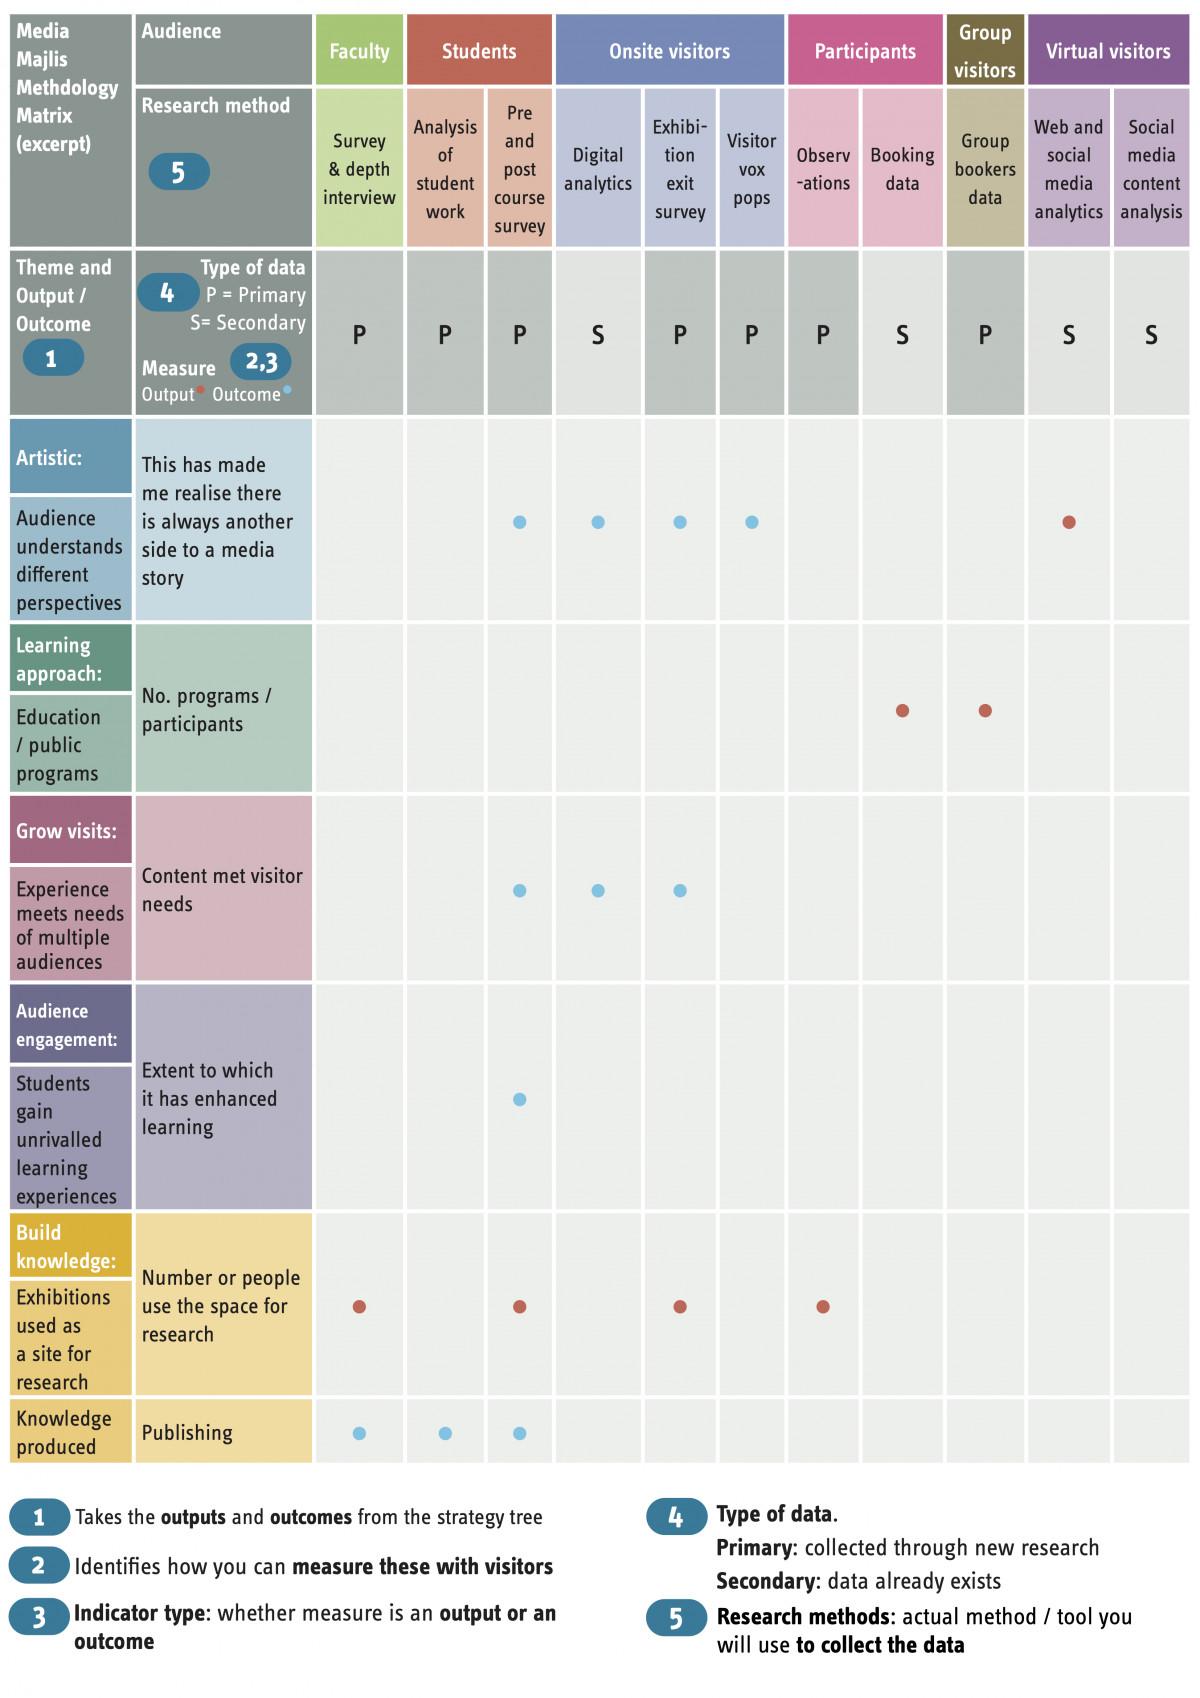 eng-media-majlis-methodology-matrix-v4-portrait.jpg